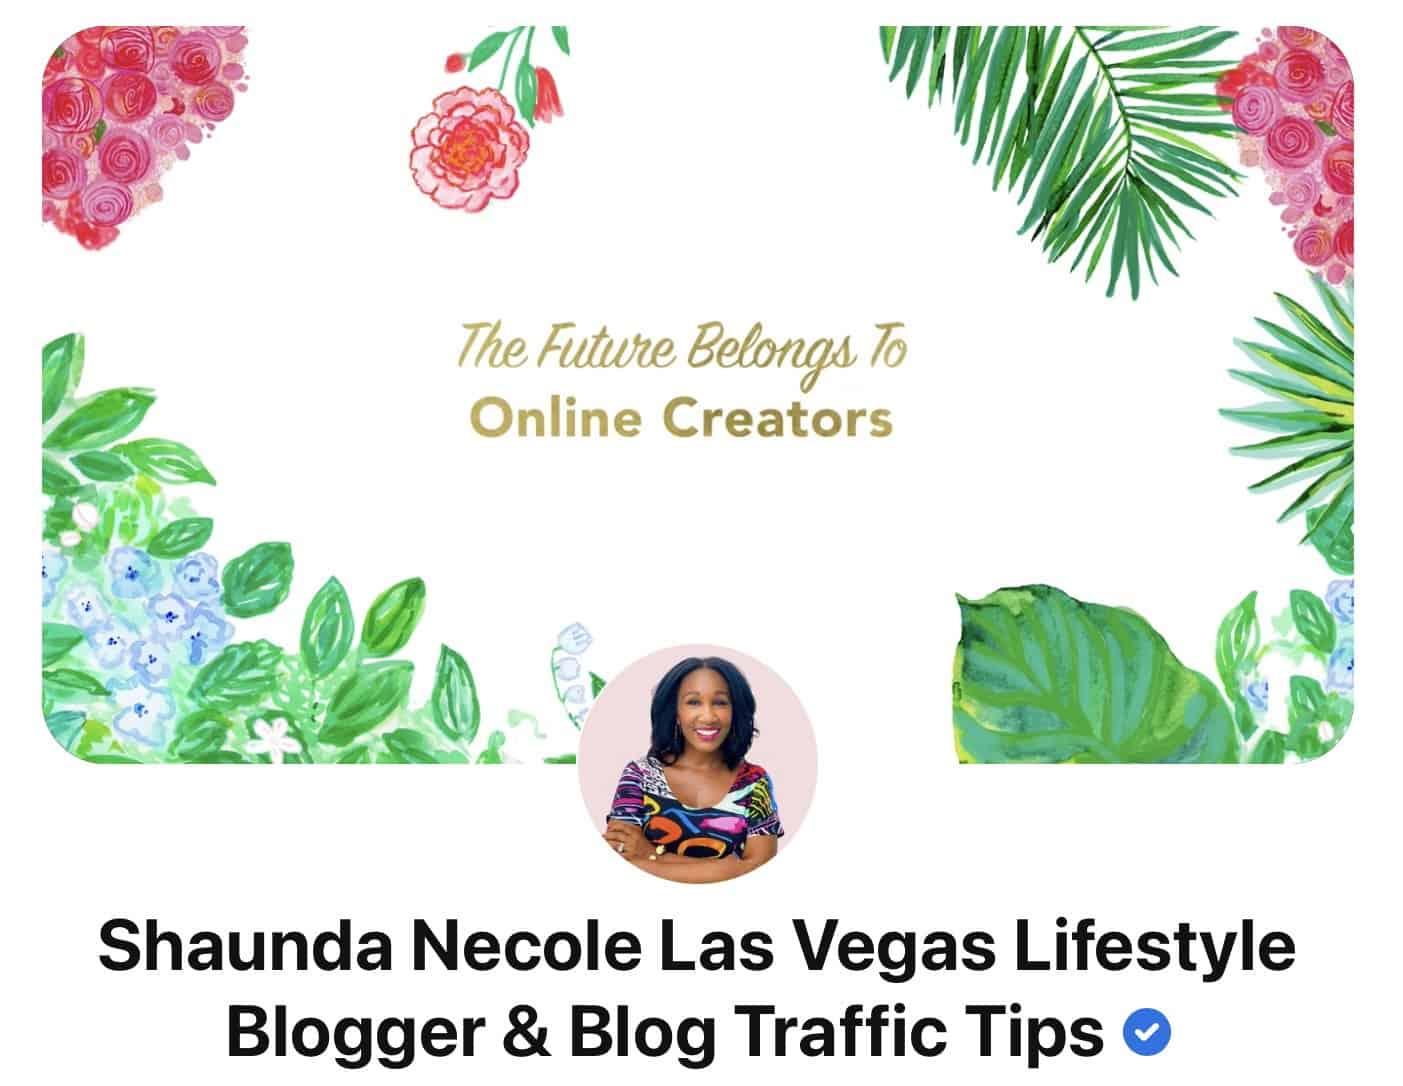 Shaunda Necole Verified on Pinterest- The Future Economy Belongs to Bloggers & Online Creators